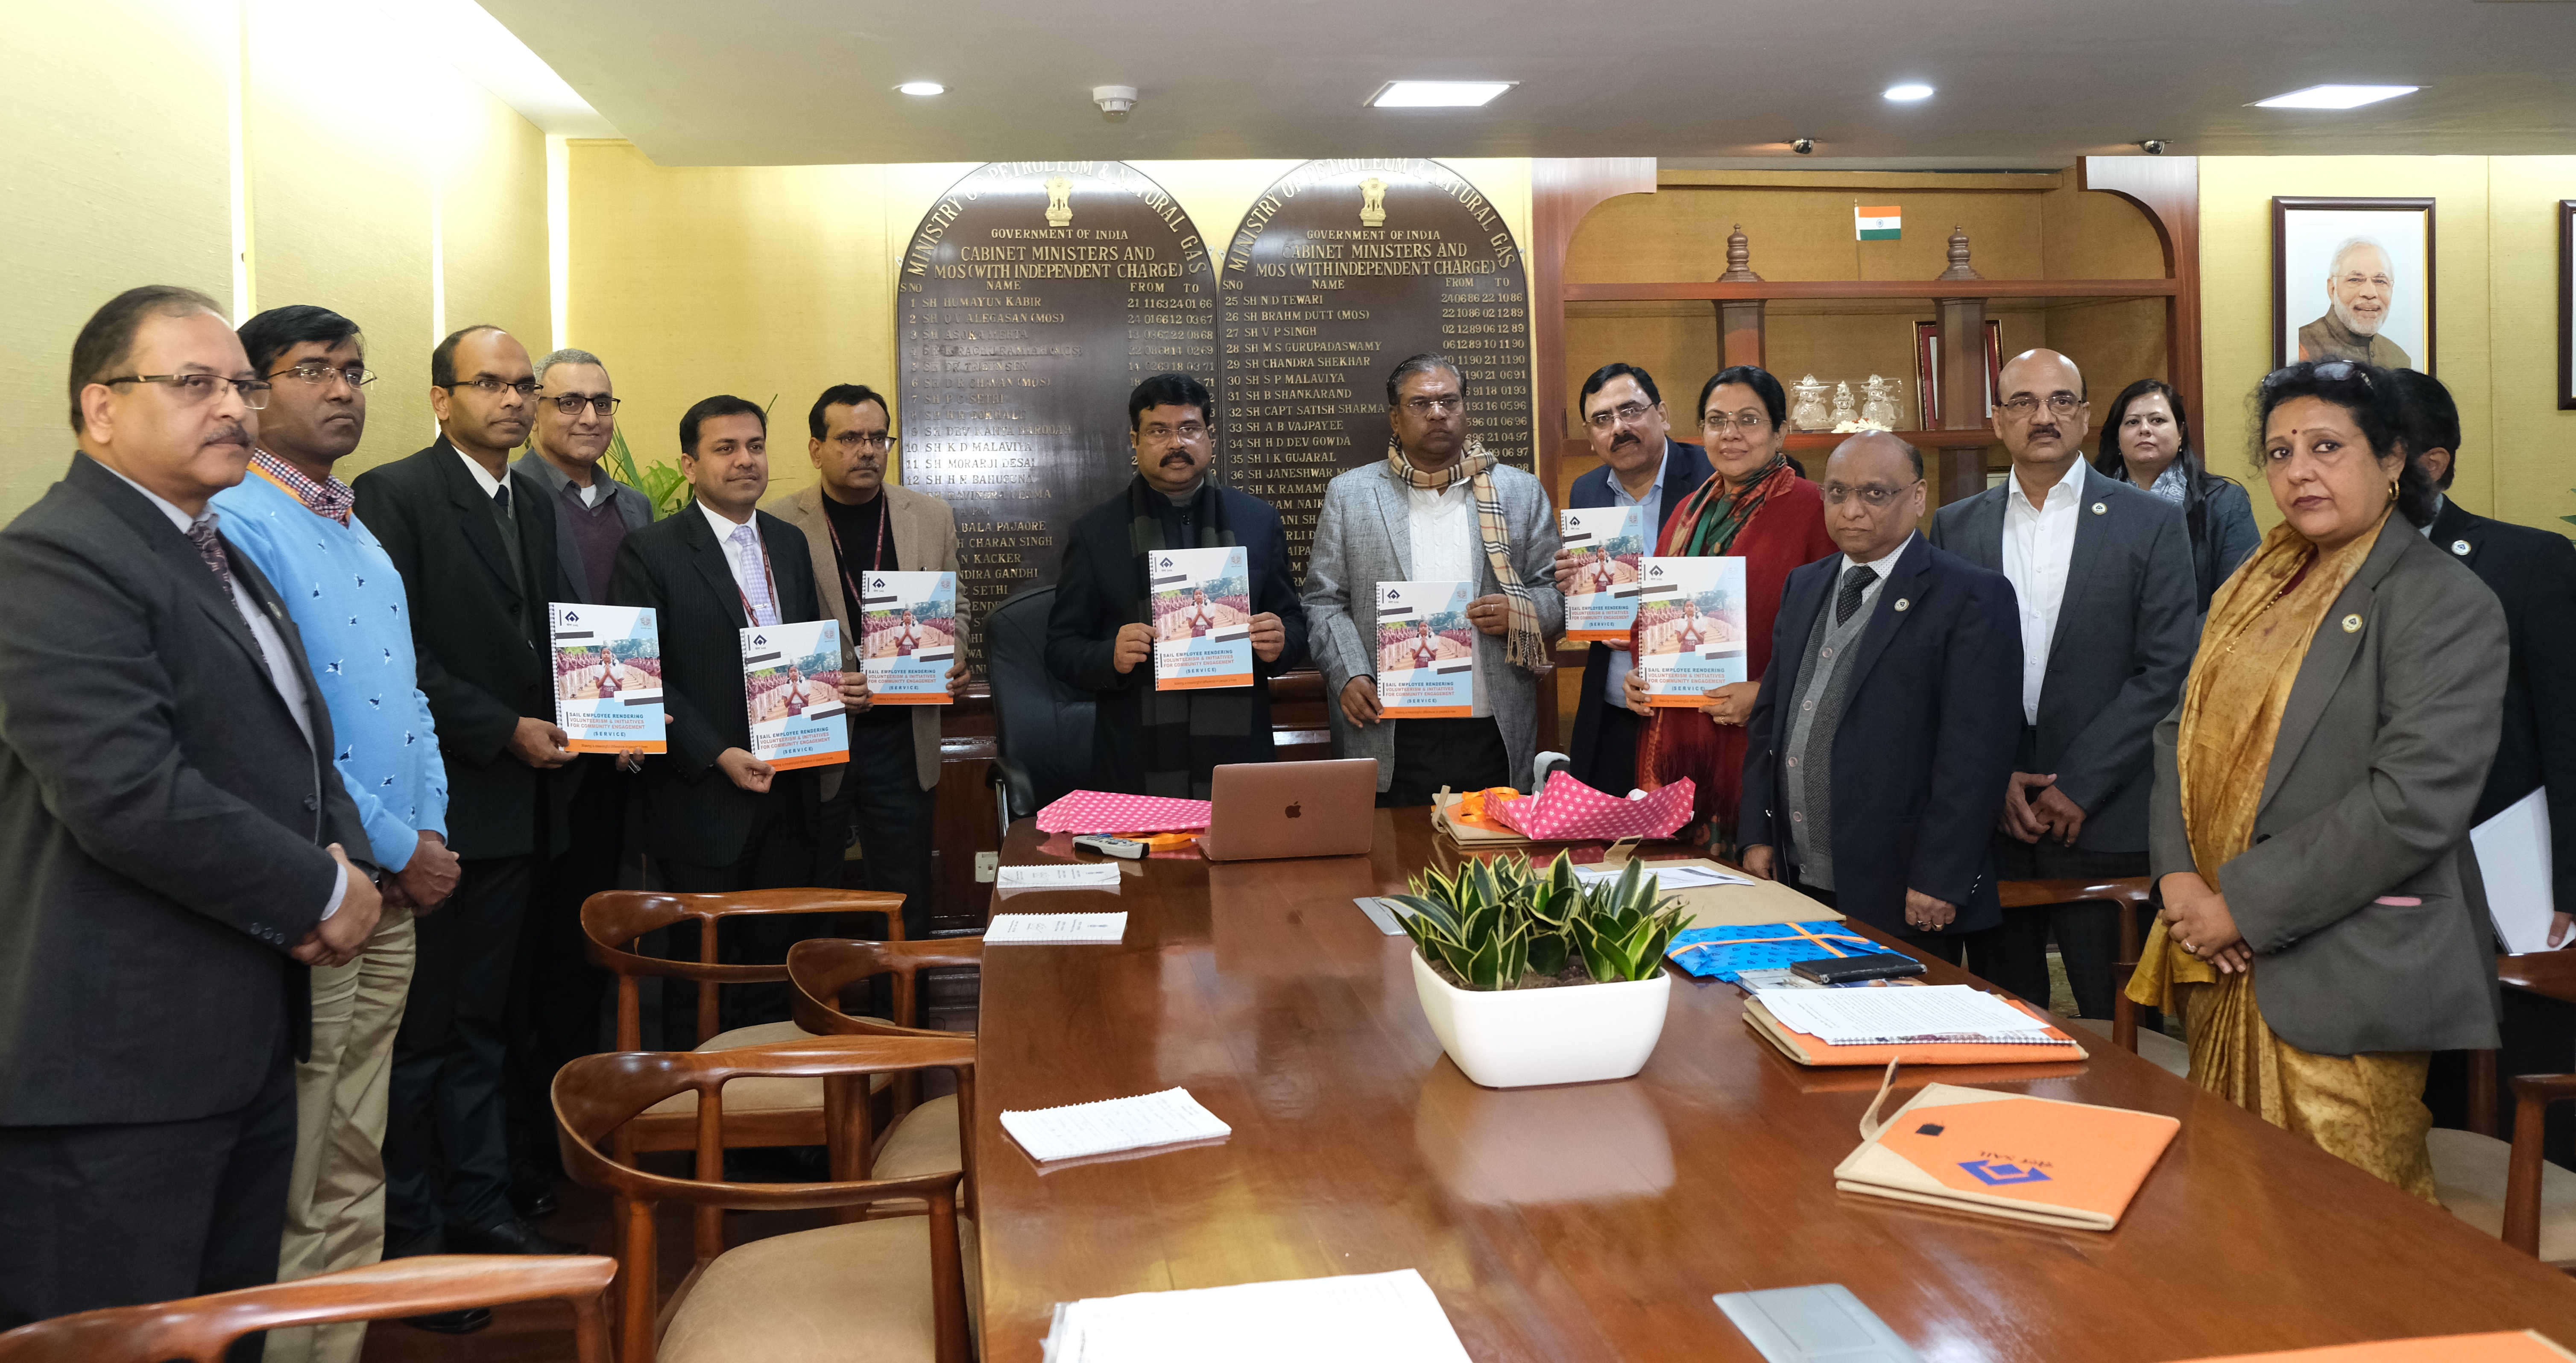 Dharmendra Pradhan launches SERVICE